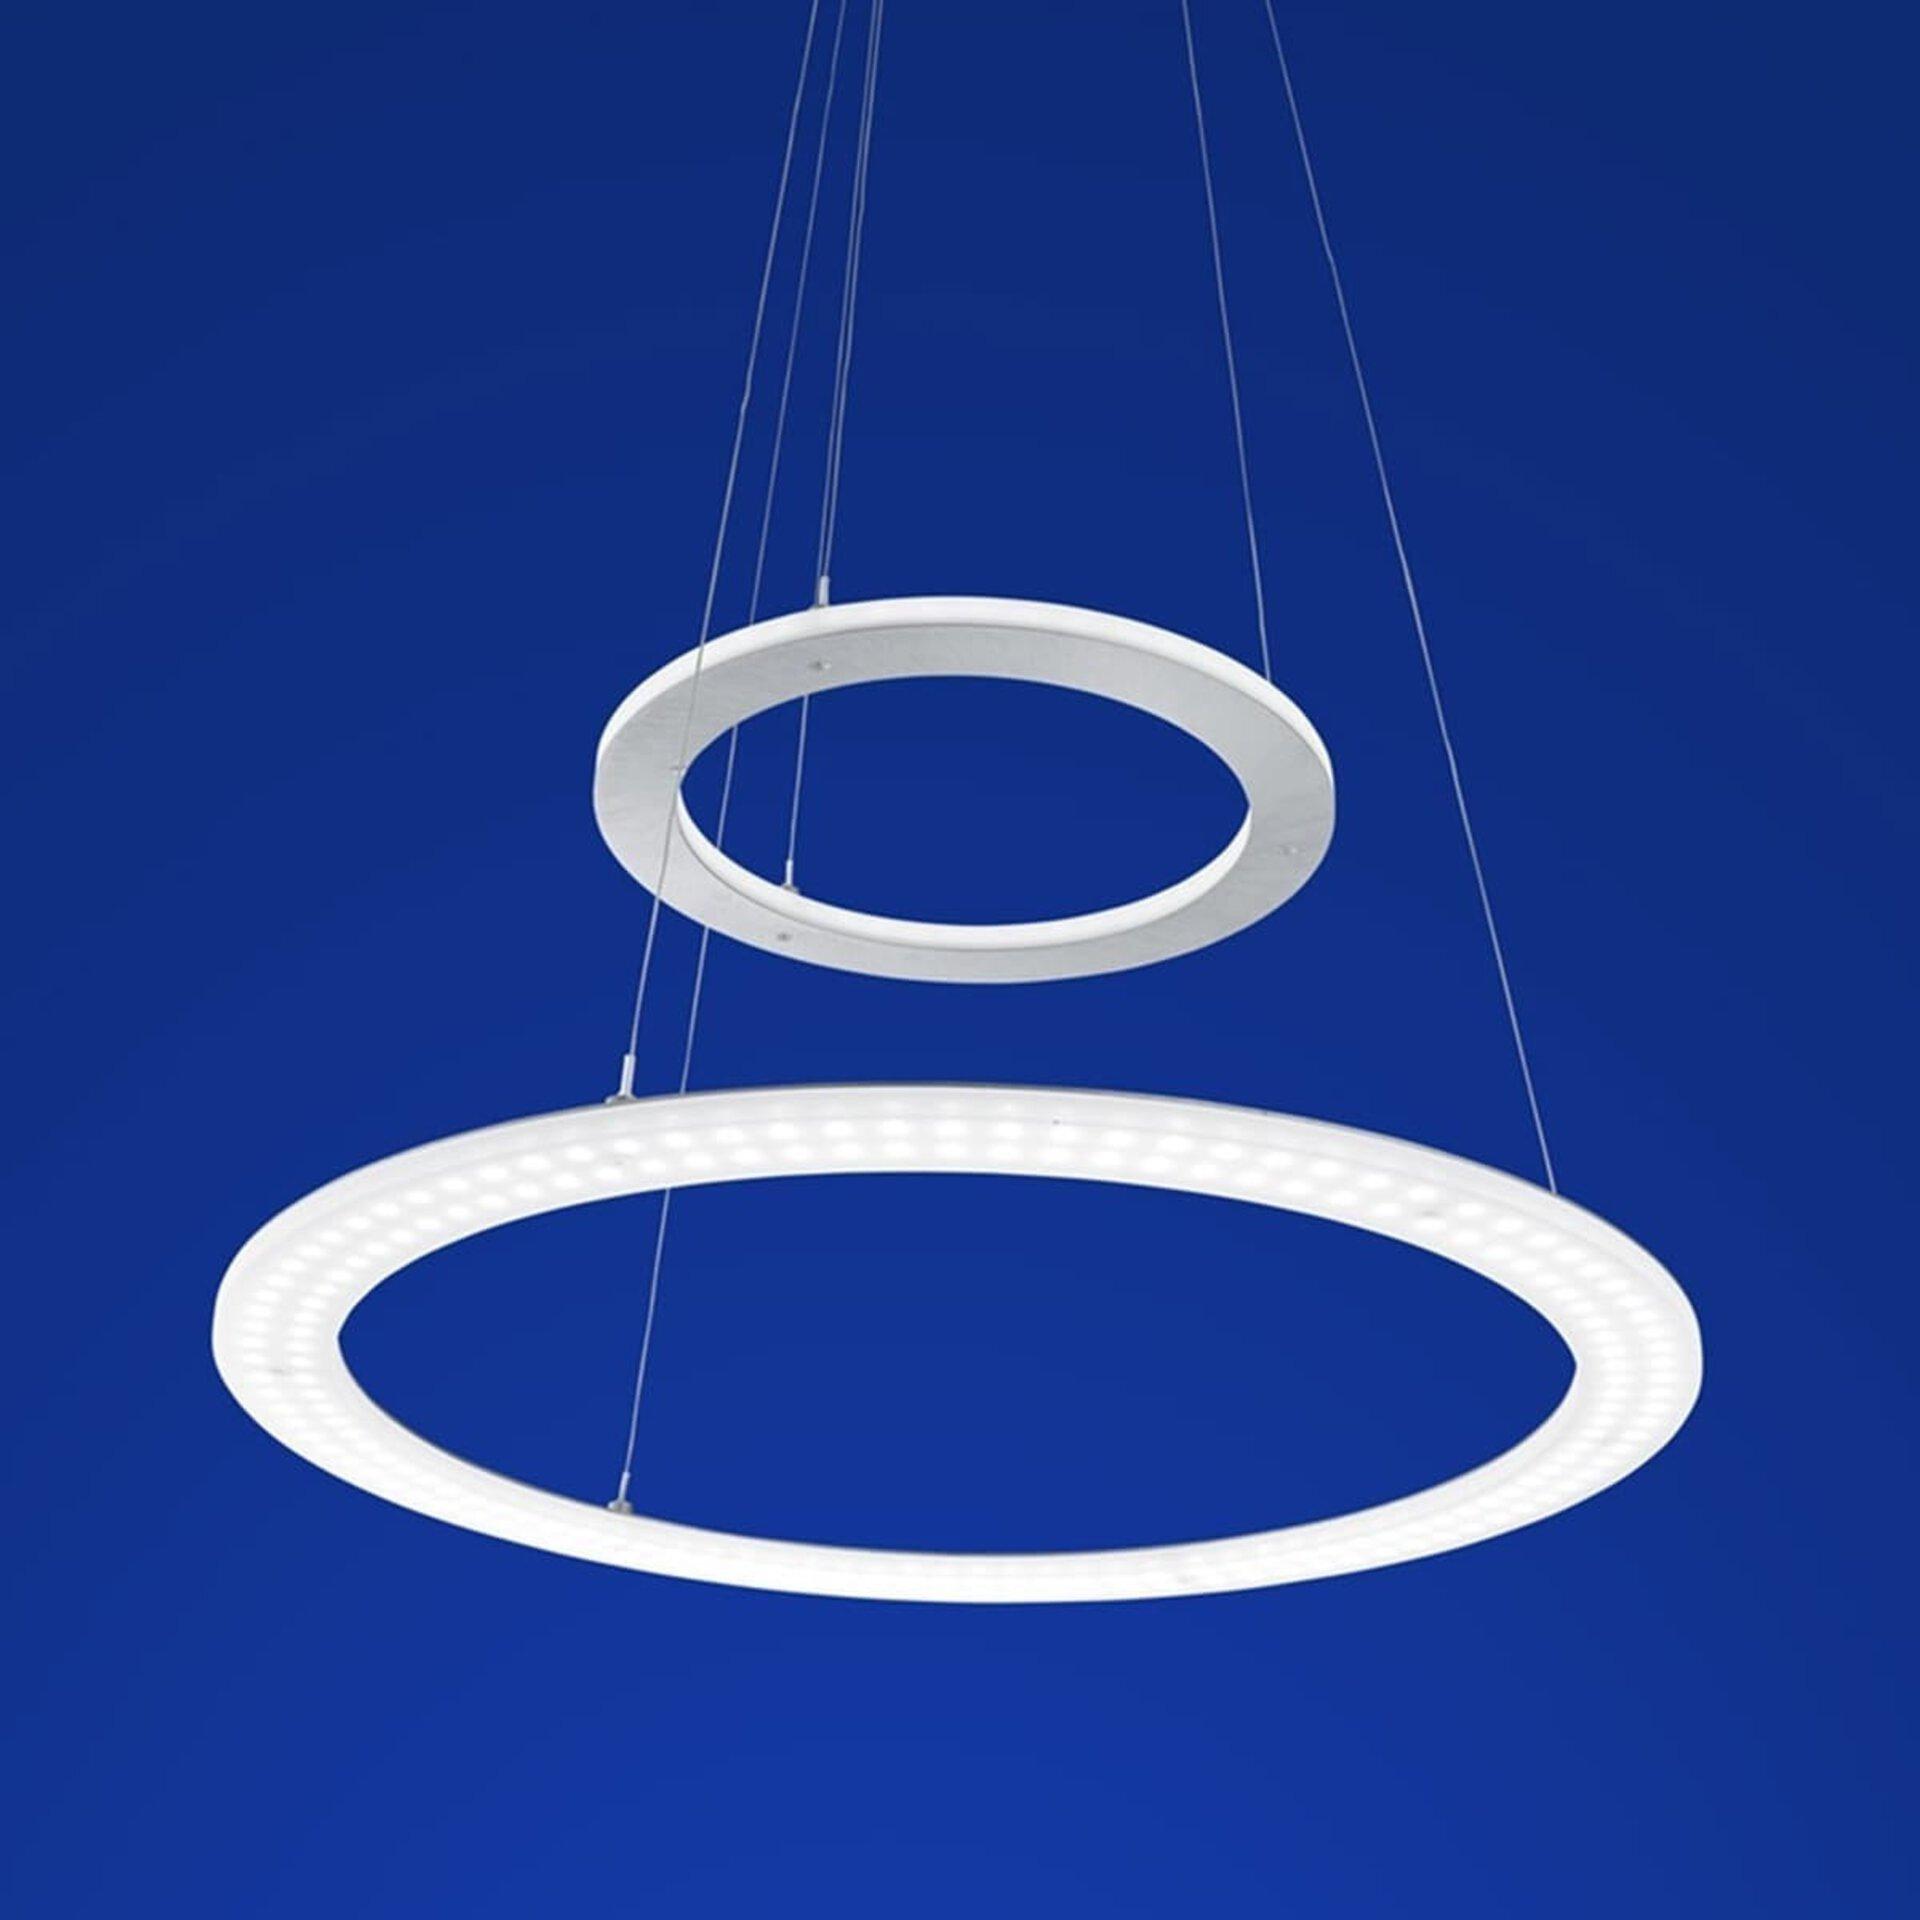 Hängeleuchte Mica B-Leuchten Metall silber 50 x 130 x 50 cm